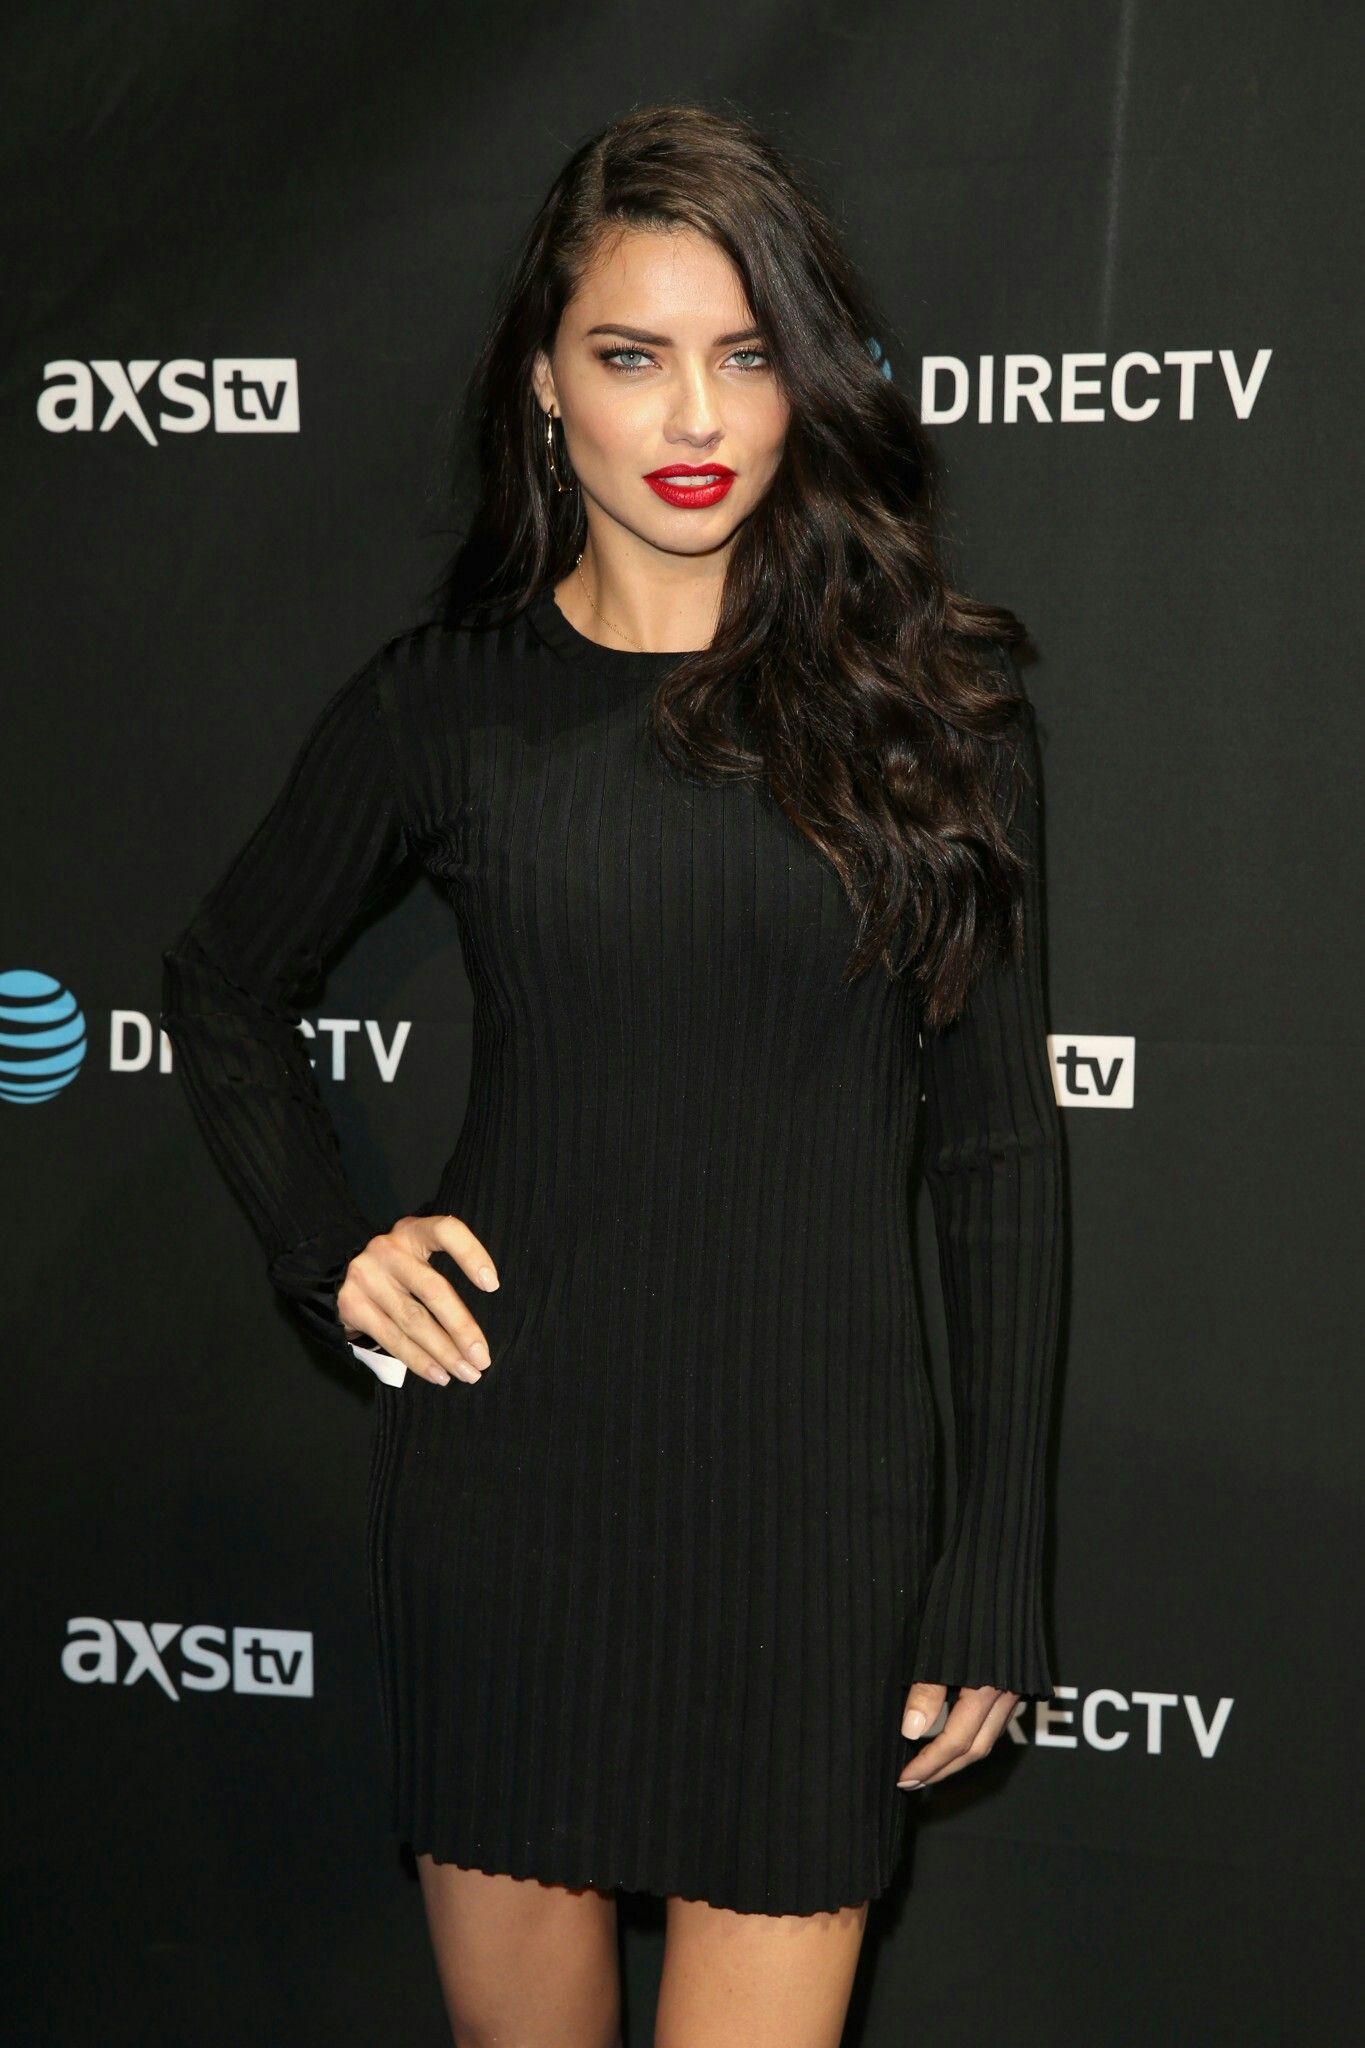 Black dress with red lipstick - Adriana Lima L Black Dress Red Lips